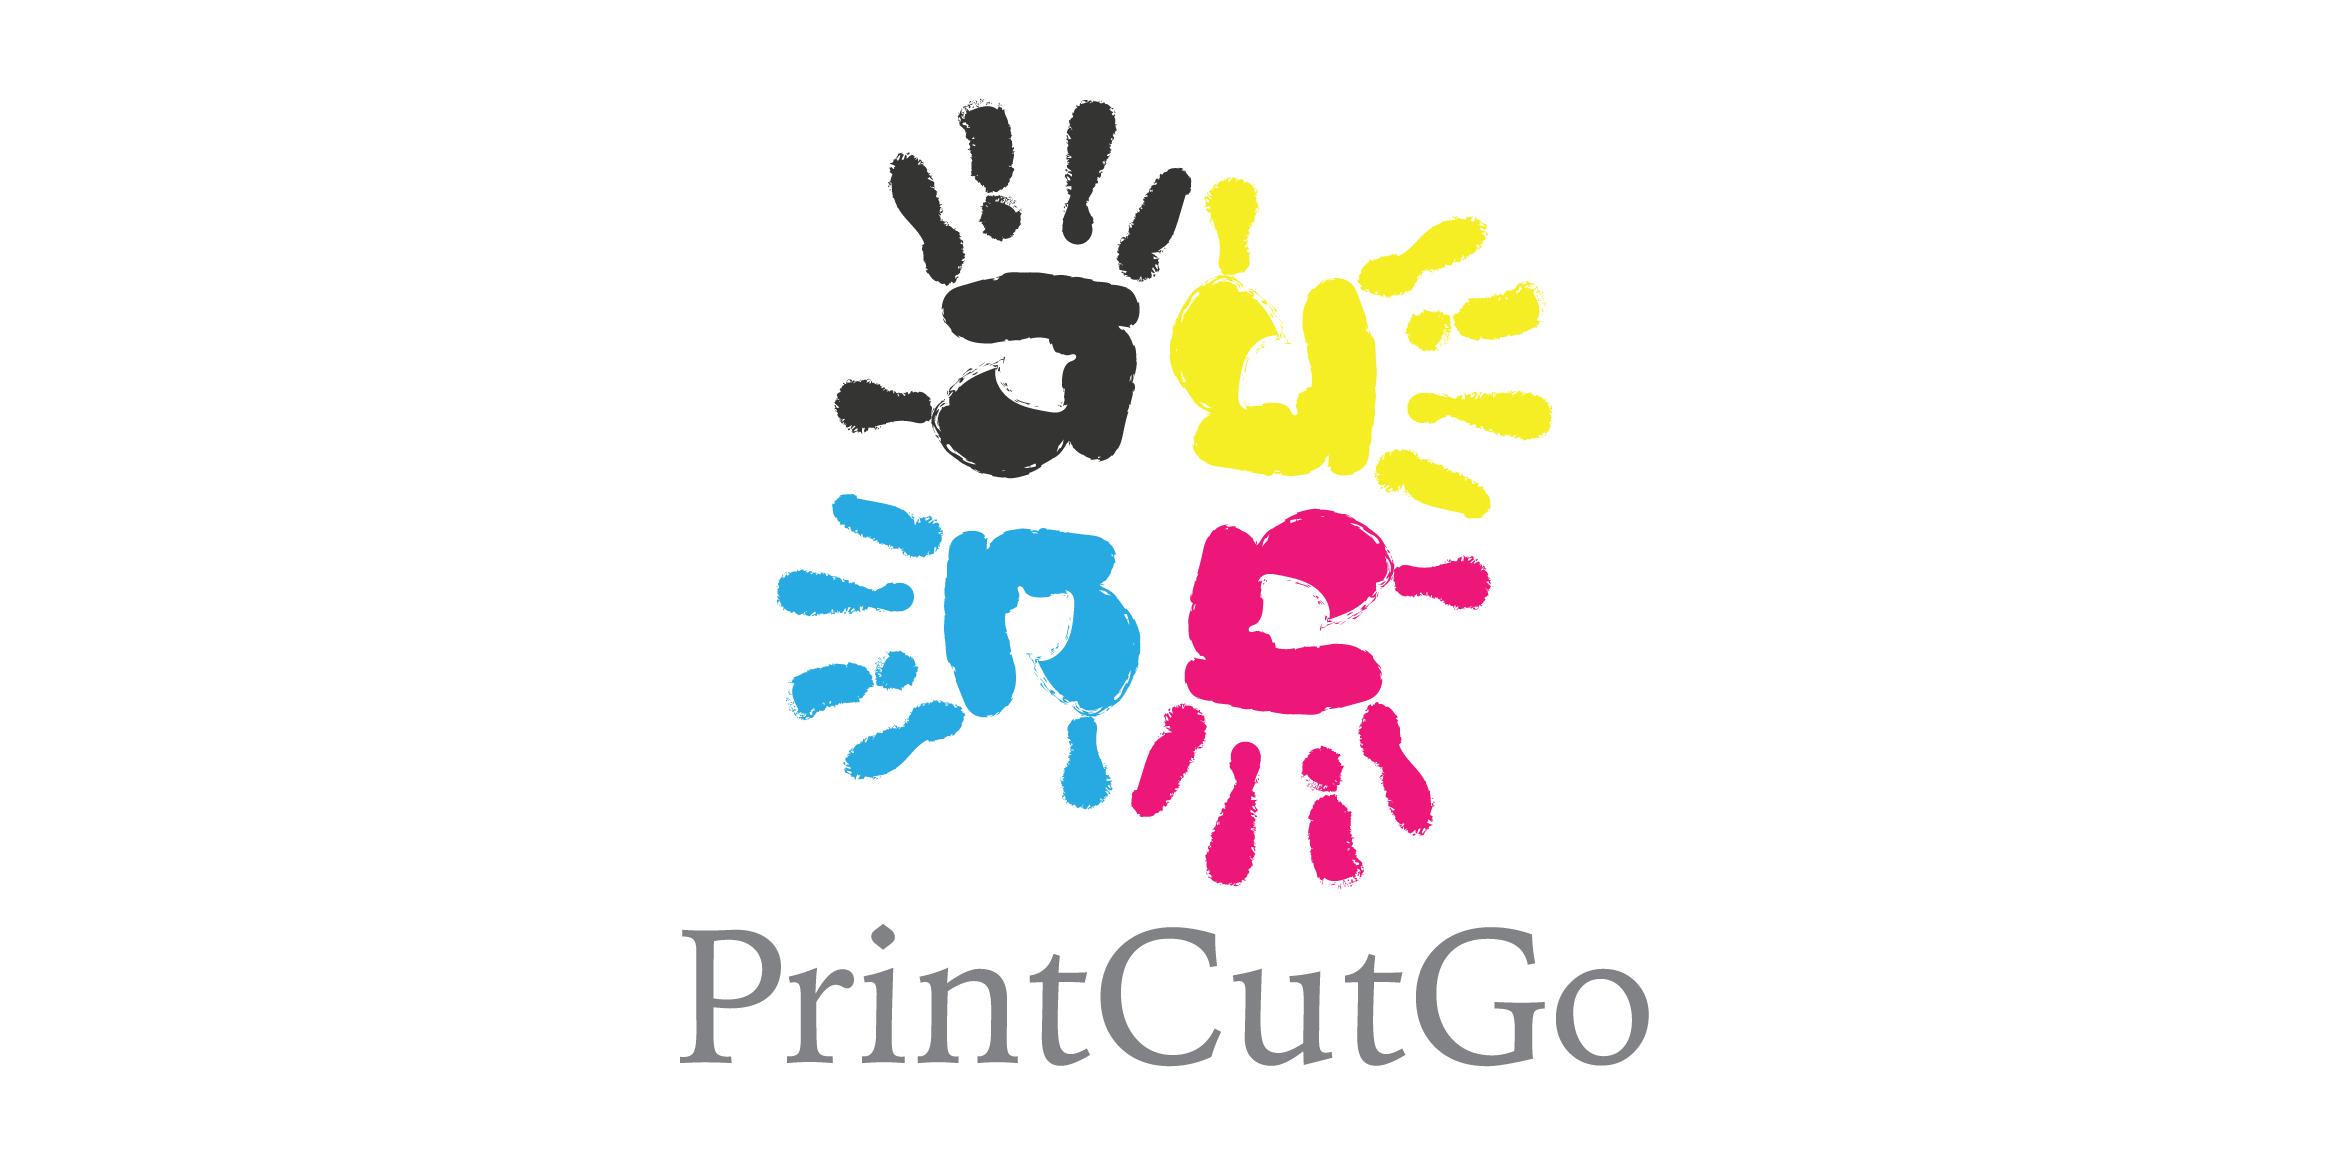 PrintCutGo